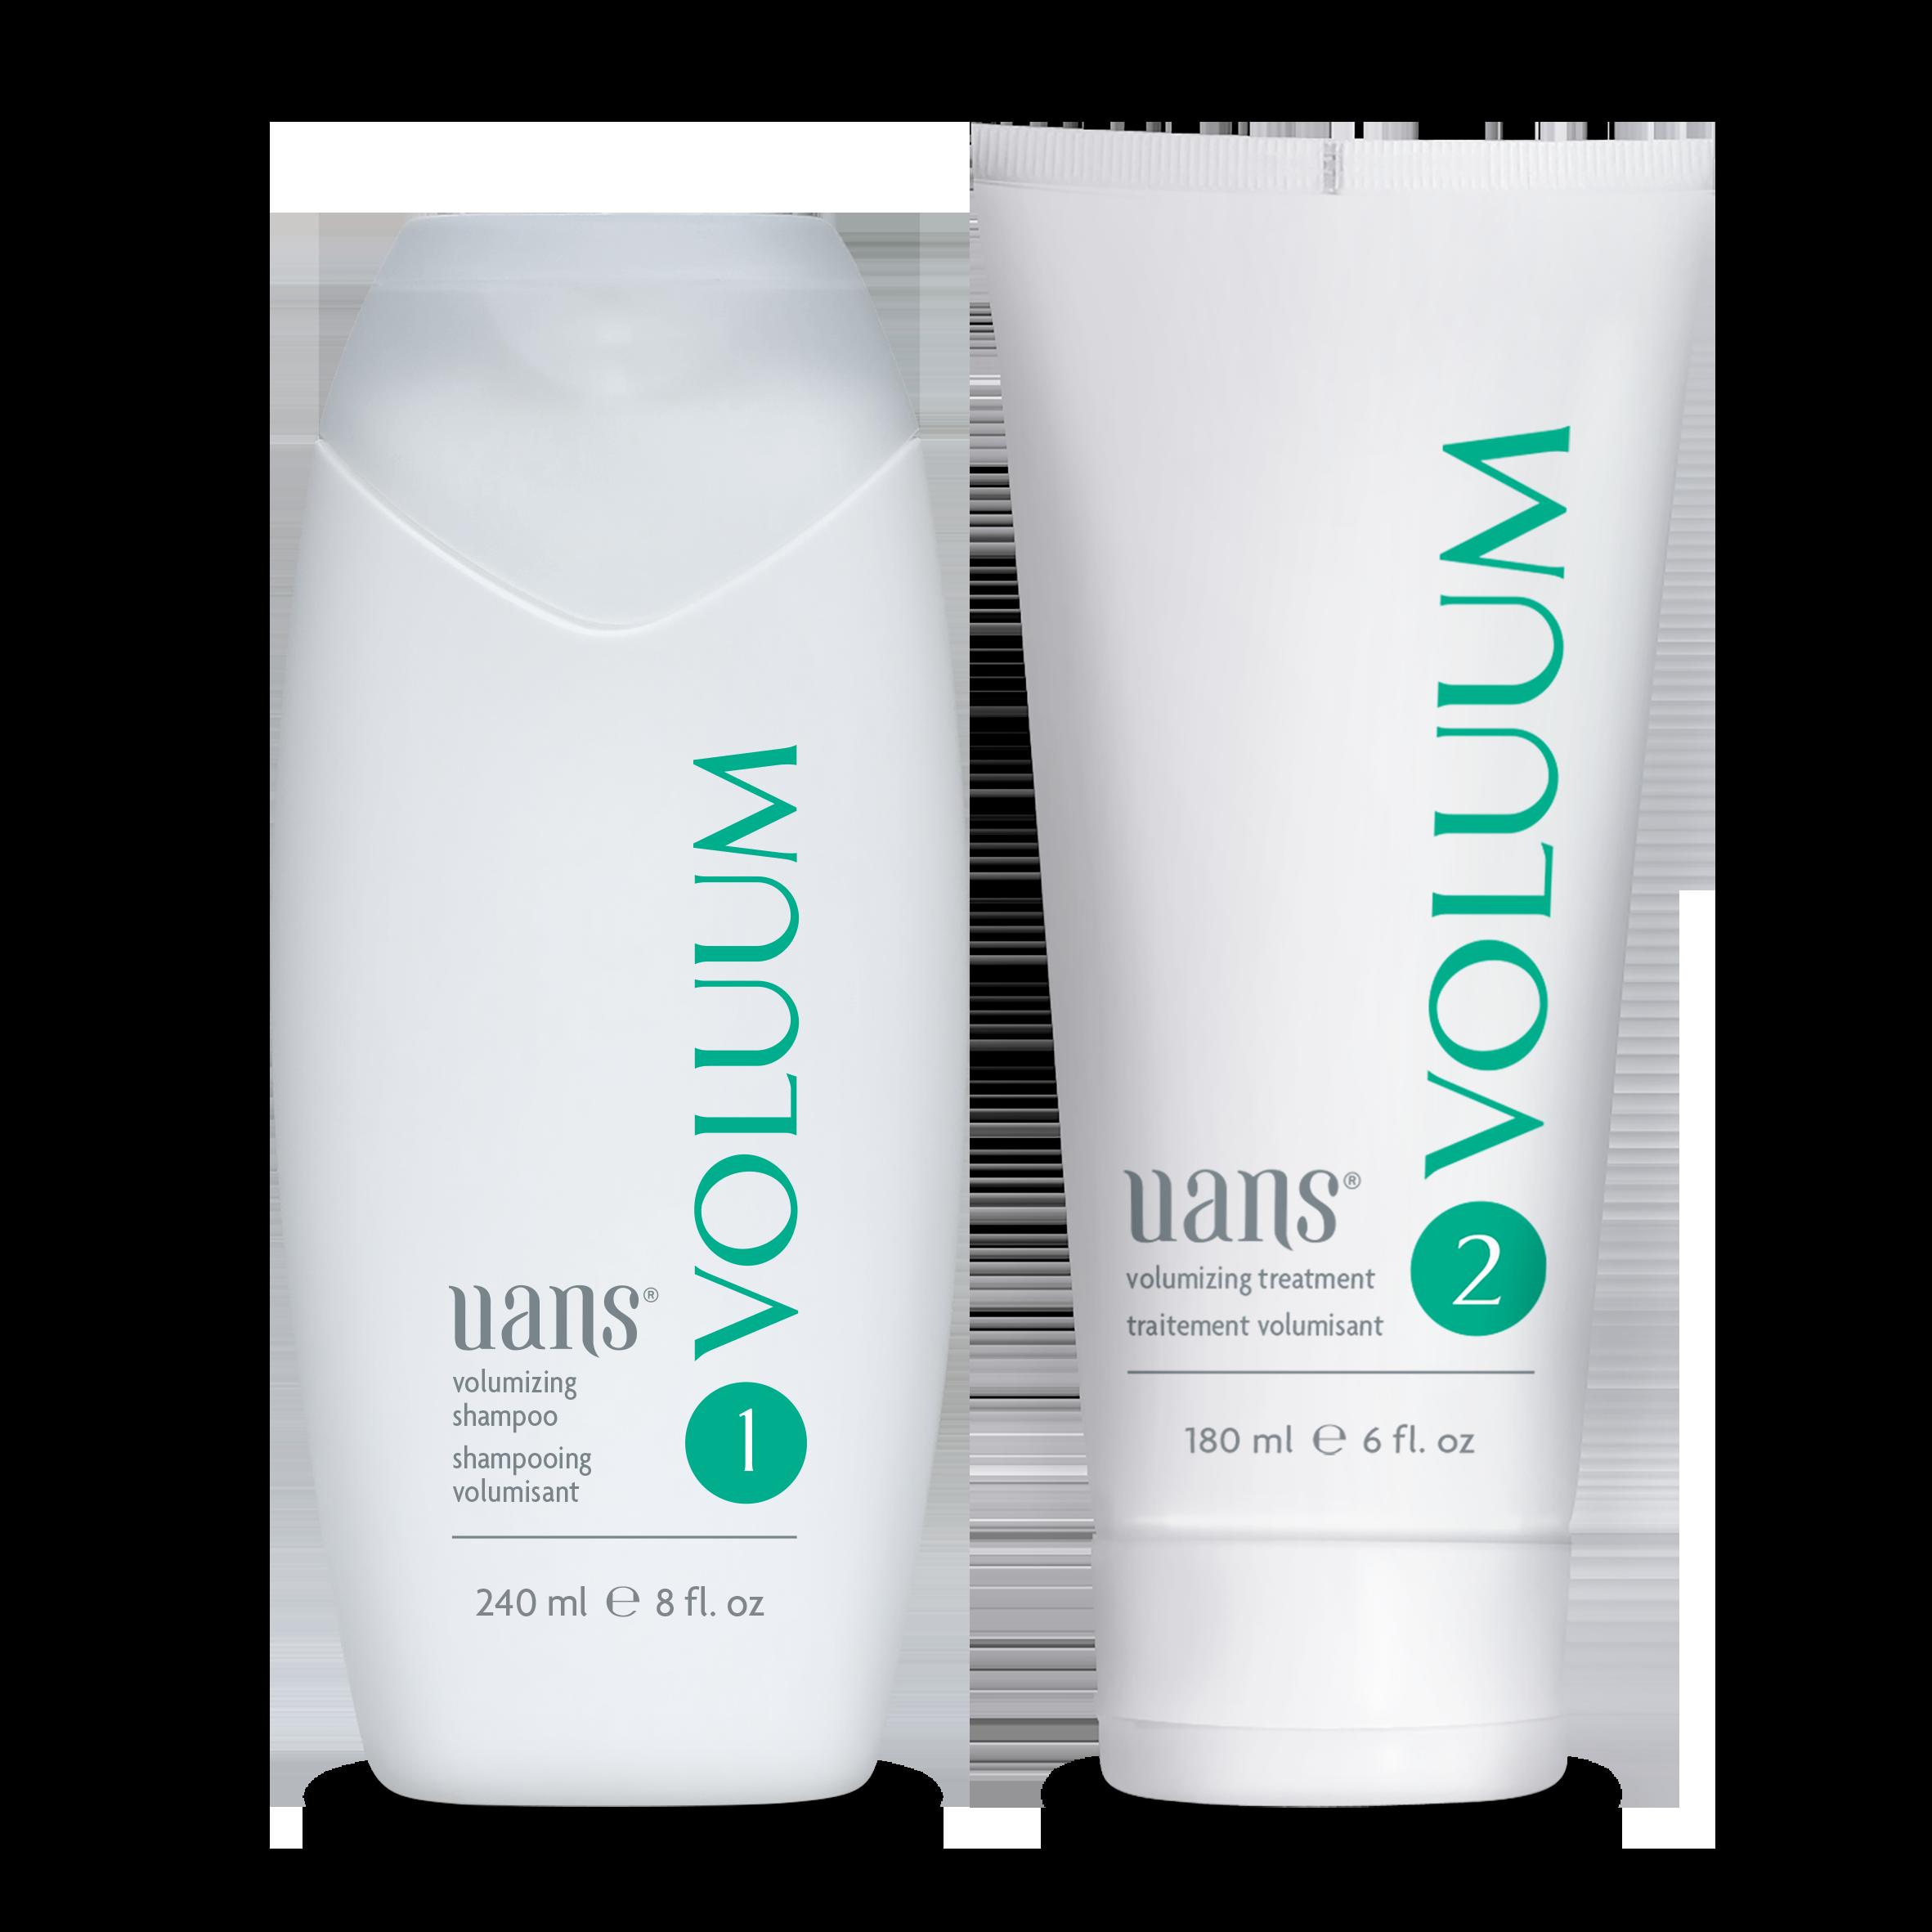 Voluum_treatment_180ml_Shampoo_240ml.png